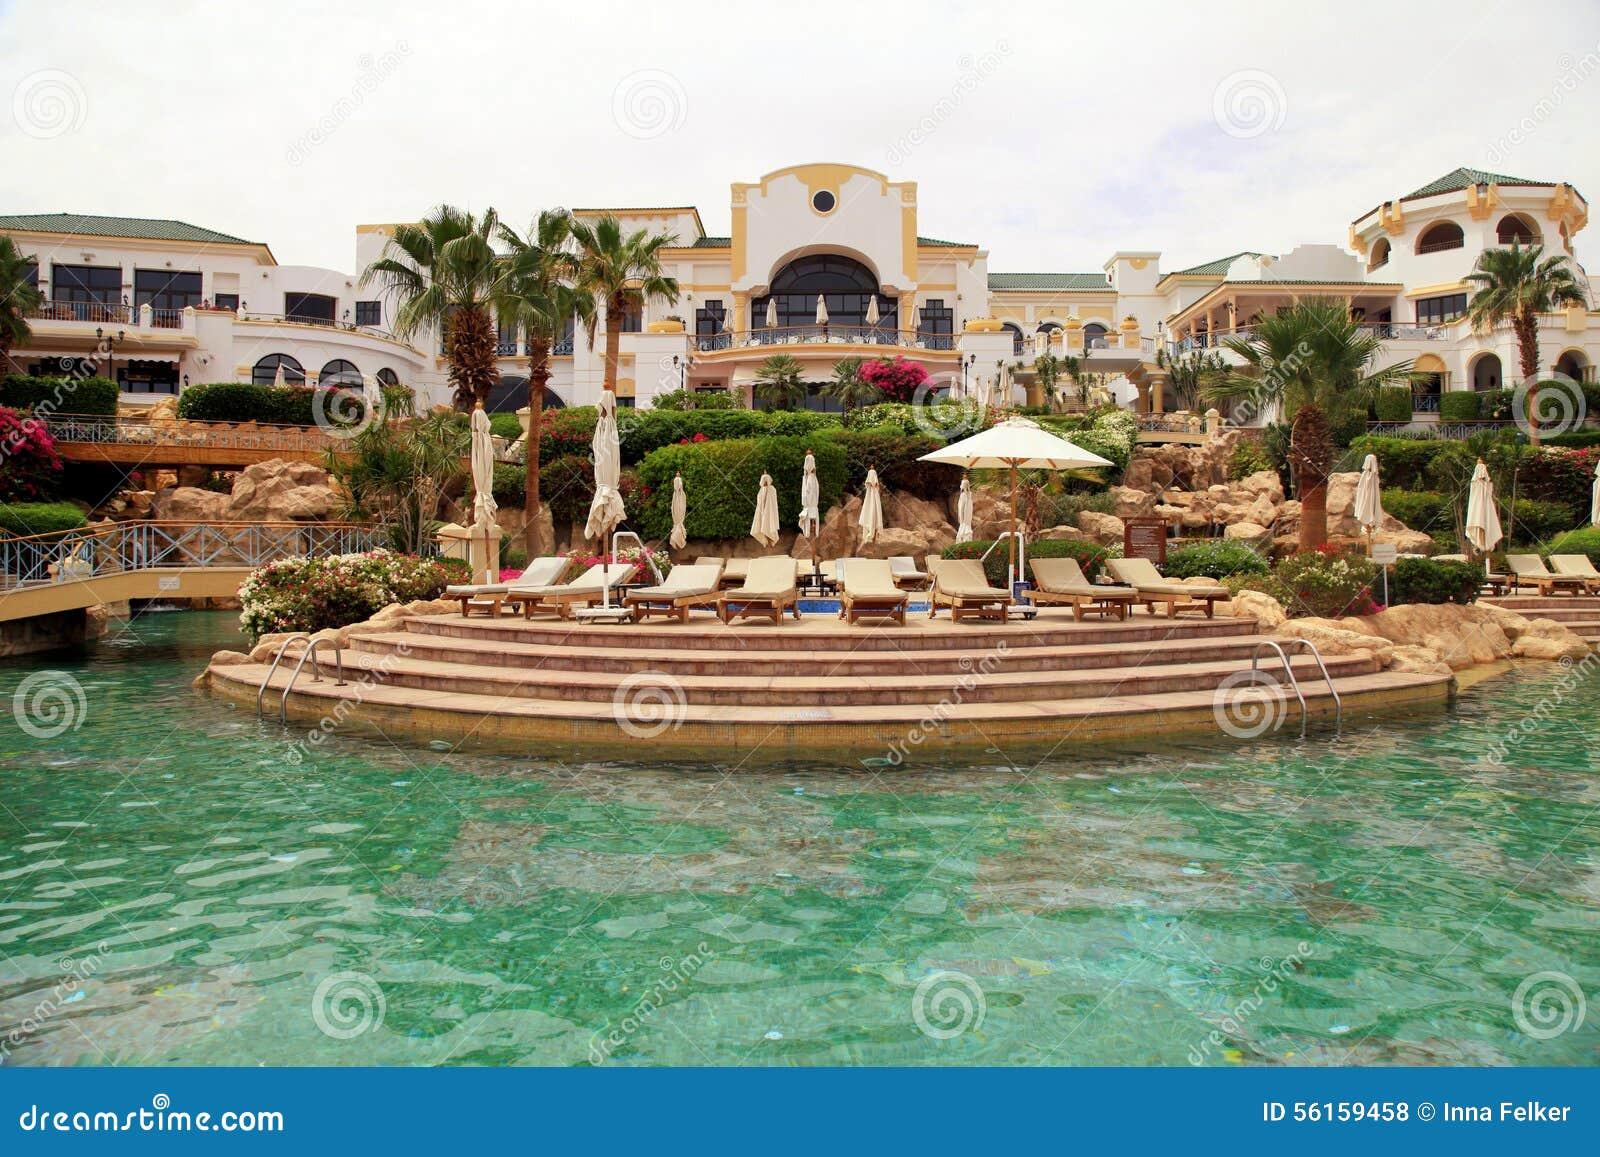 Five Star Hotel Cape May Nj